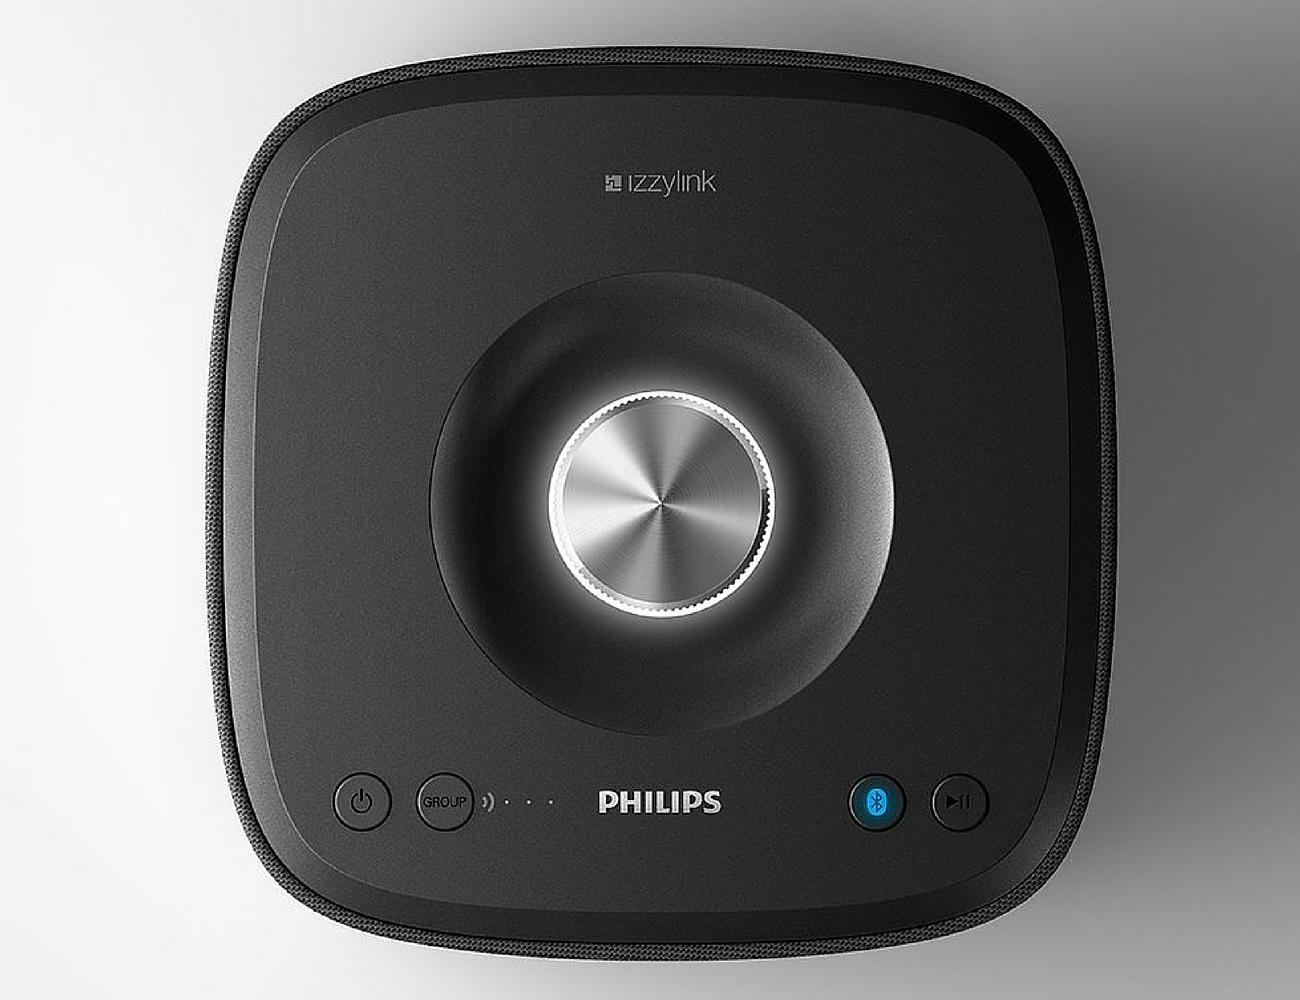 Philips izzy Multi-Room Audio System